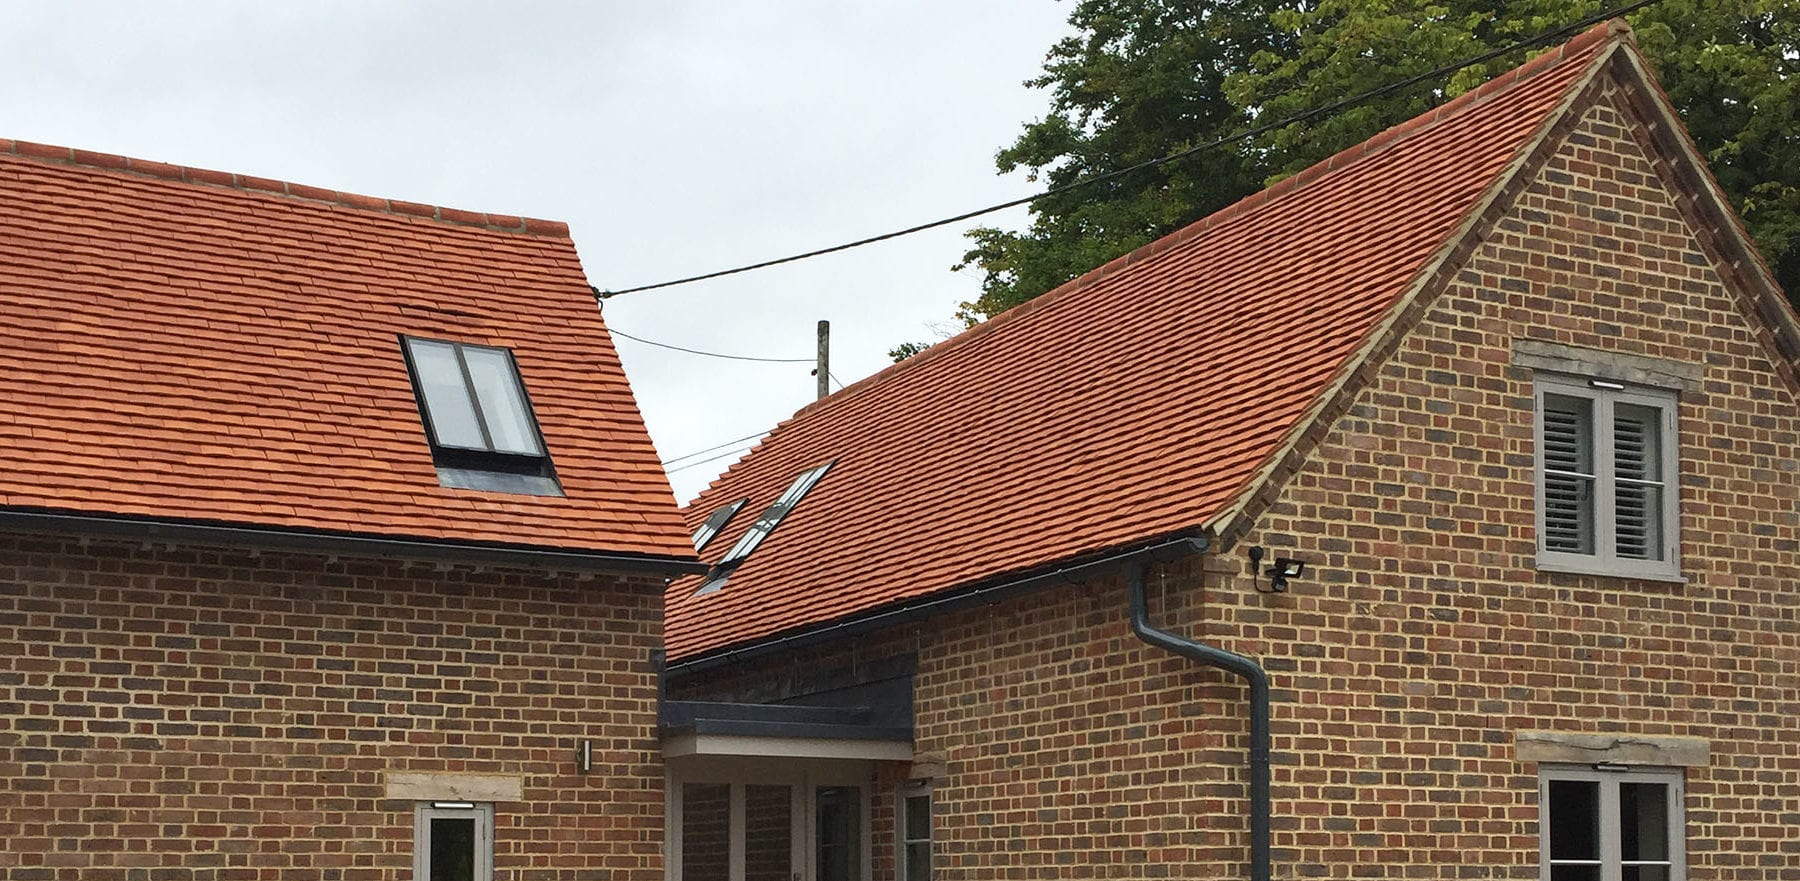 Lifestiles - Handcrafted Orange Clay Roof Tiles - Aston, England 5